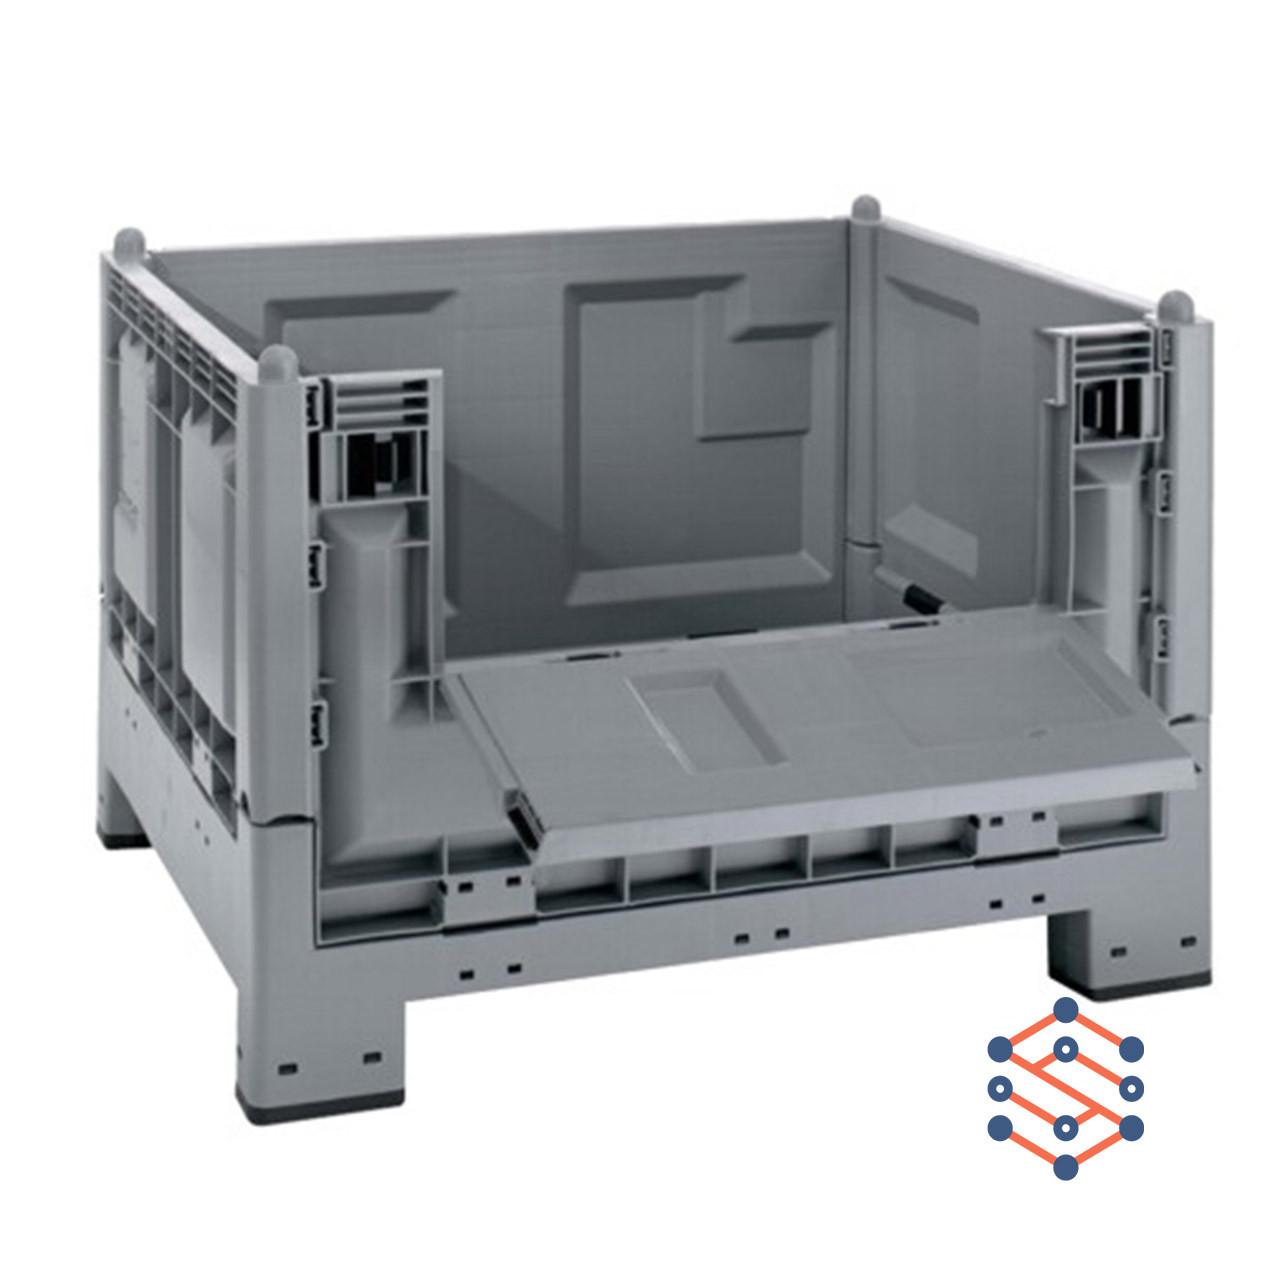 Разборной платиковый контейнер на 4-х ножках 1200x1000x847мм